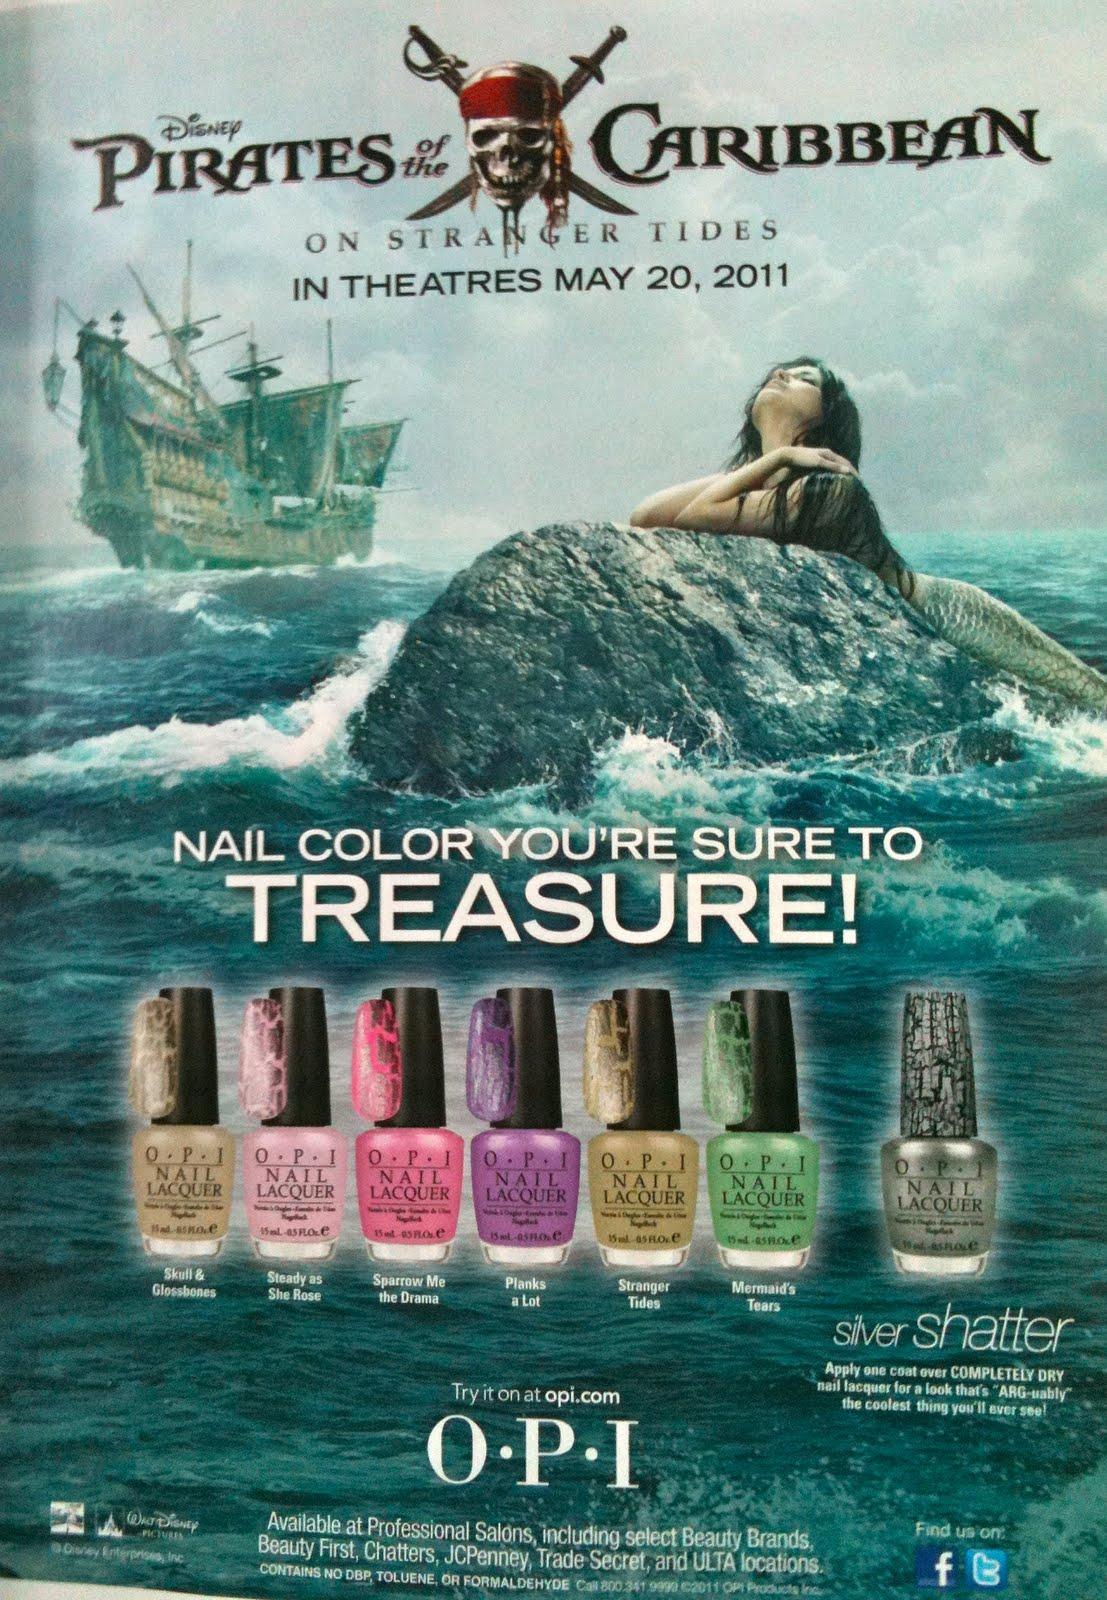 Hebridean Sprite Beauty: Interesting Magazine Ads